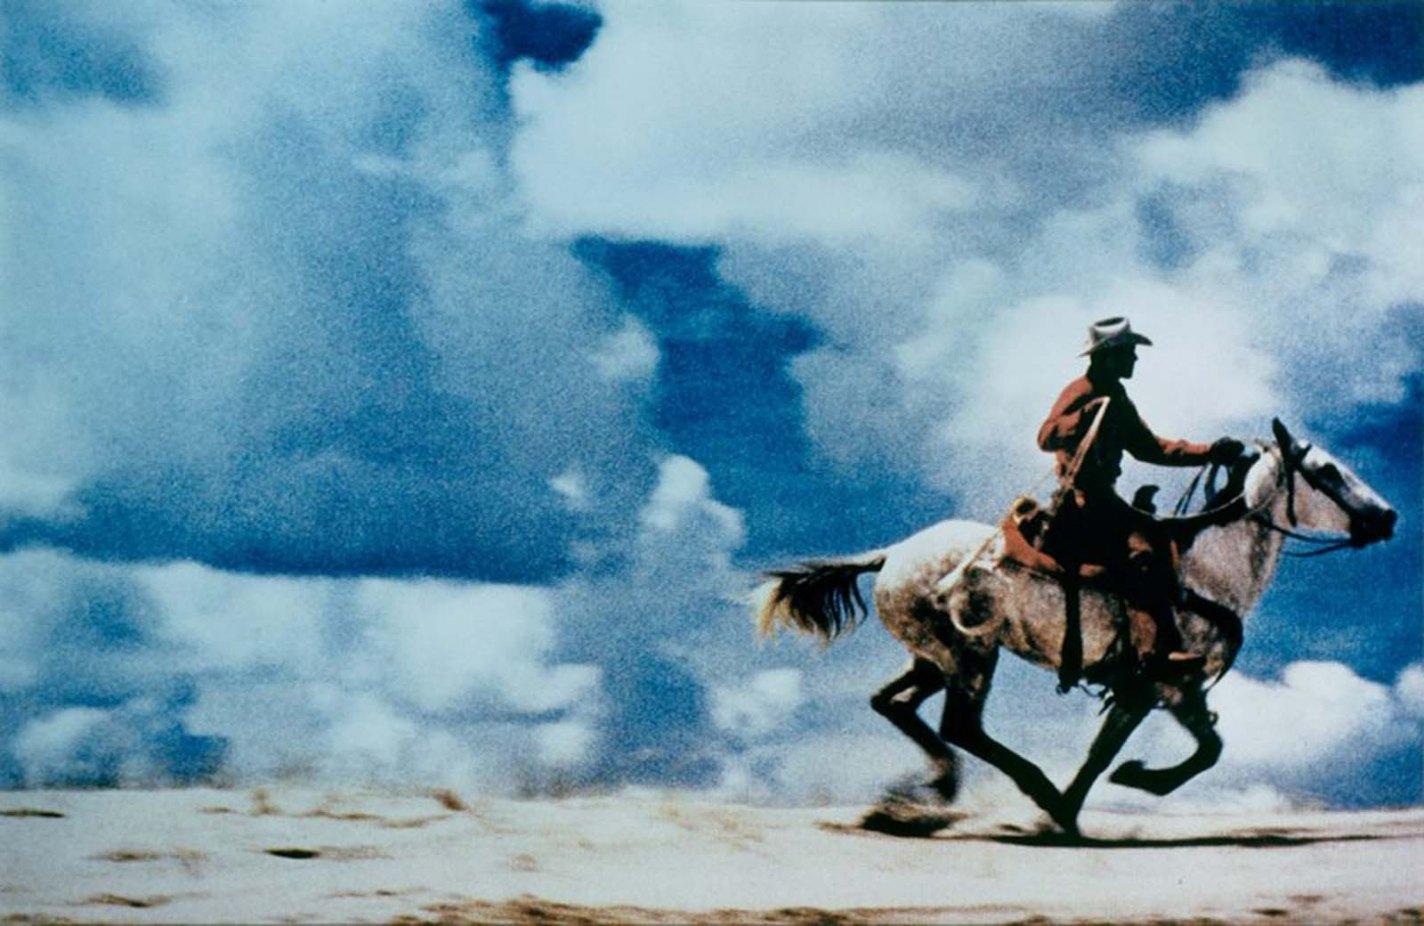 Untitled (Cowboy), Richard Prince, 1989